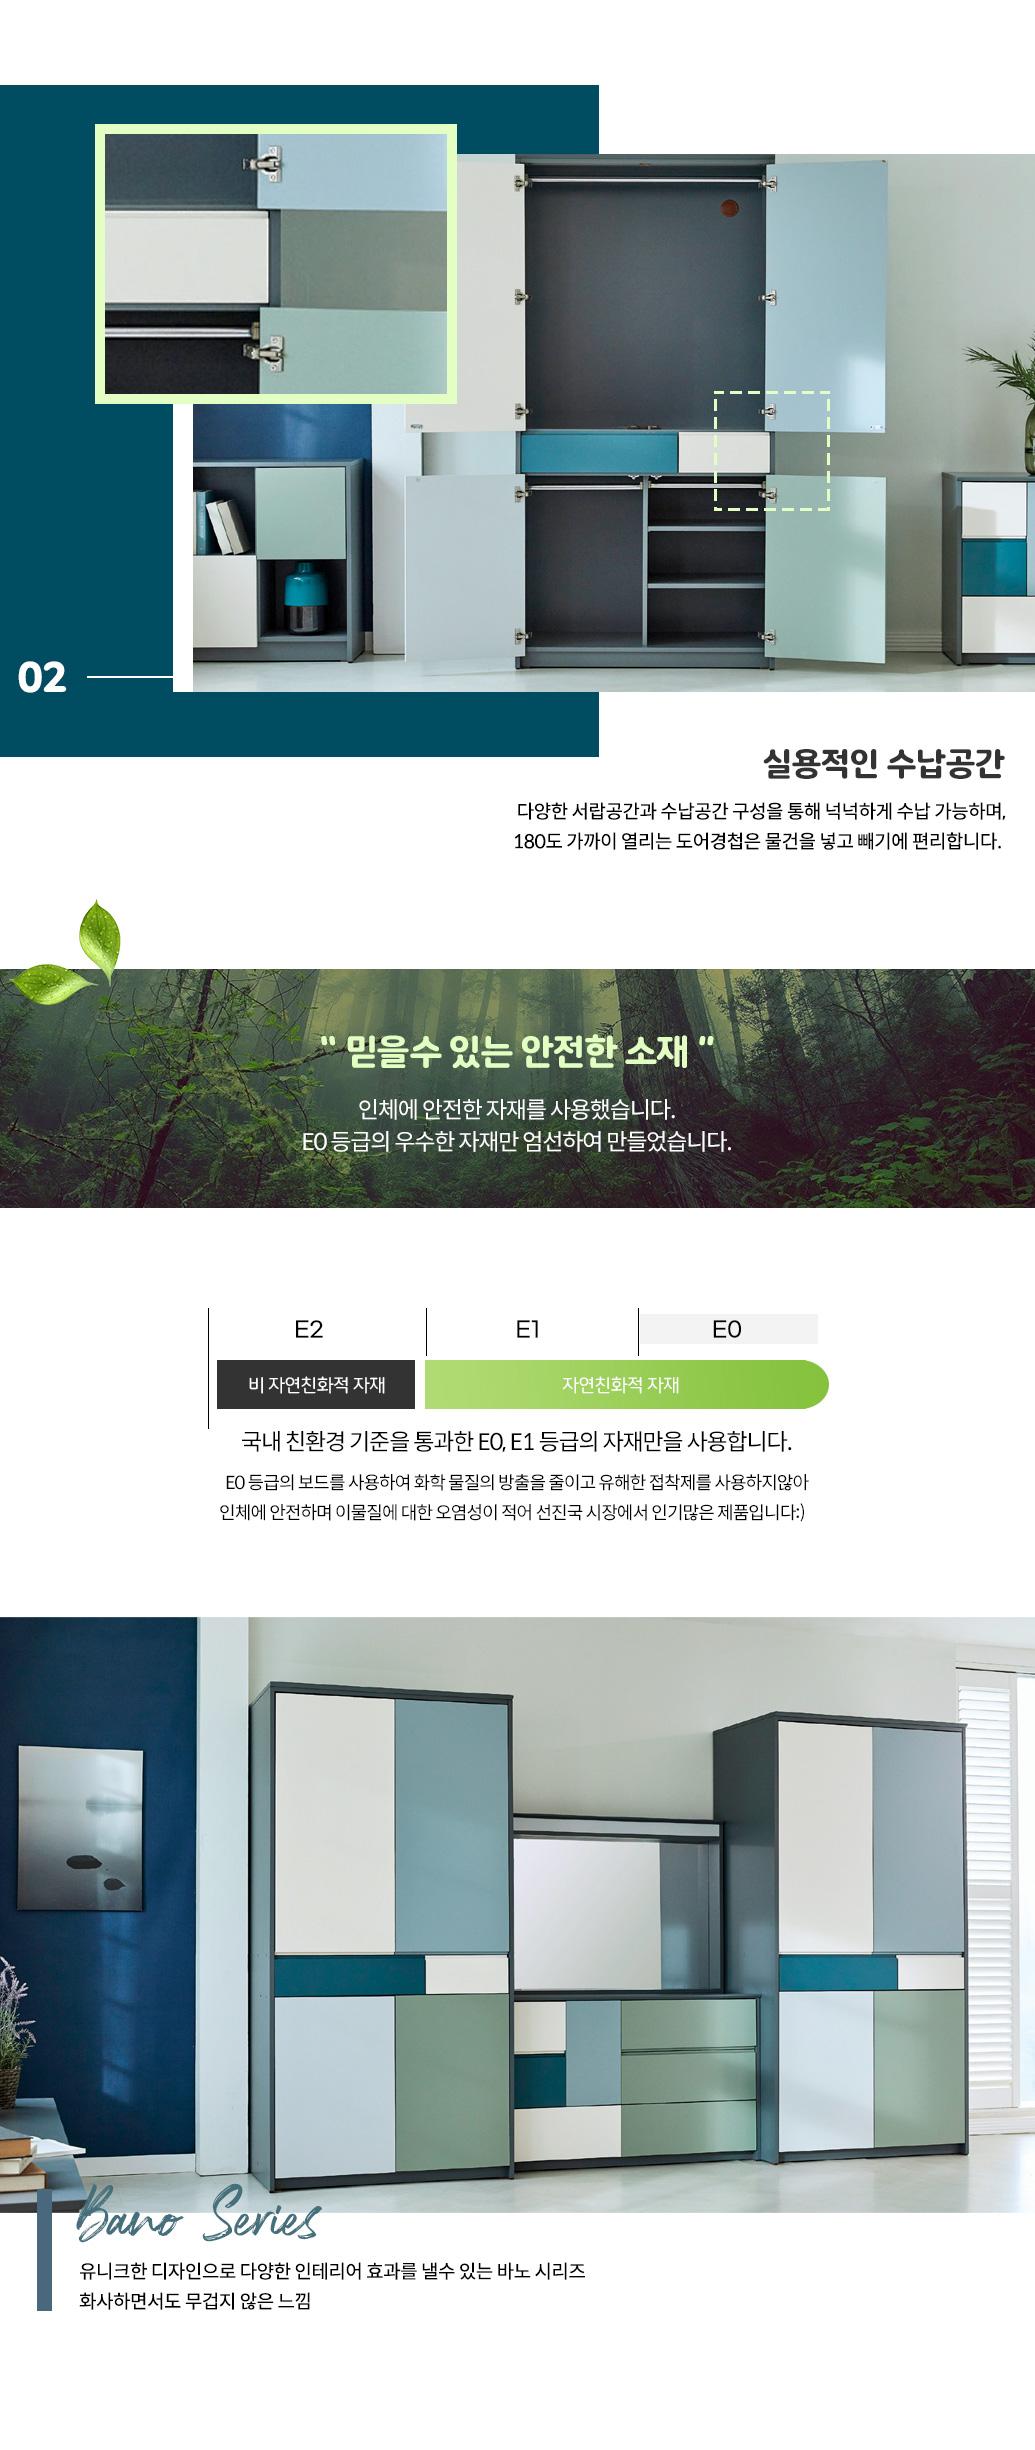 Bano_closet_03.jpg